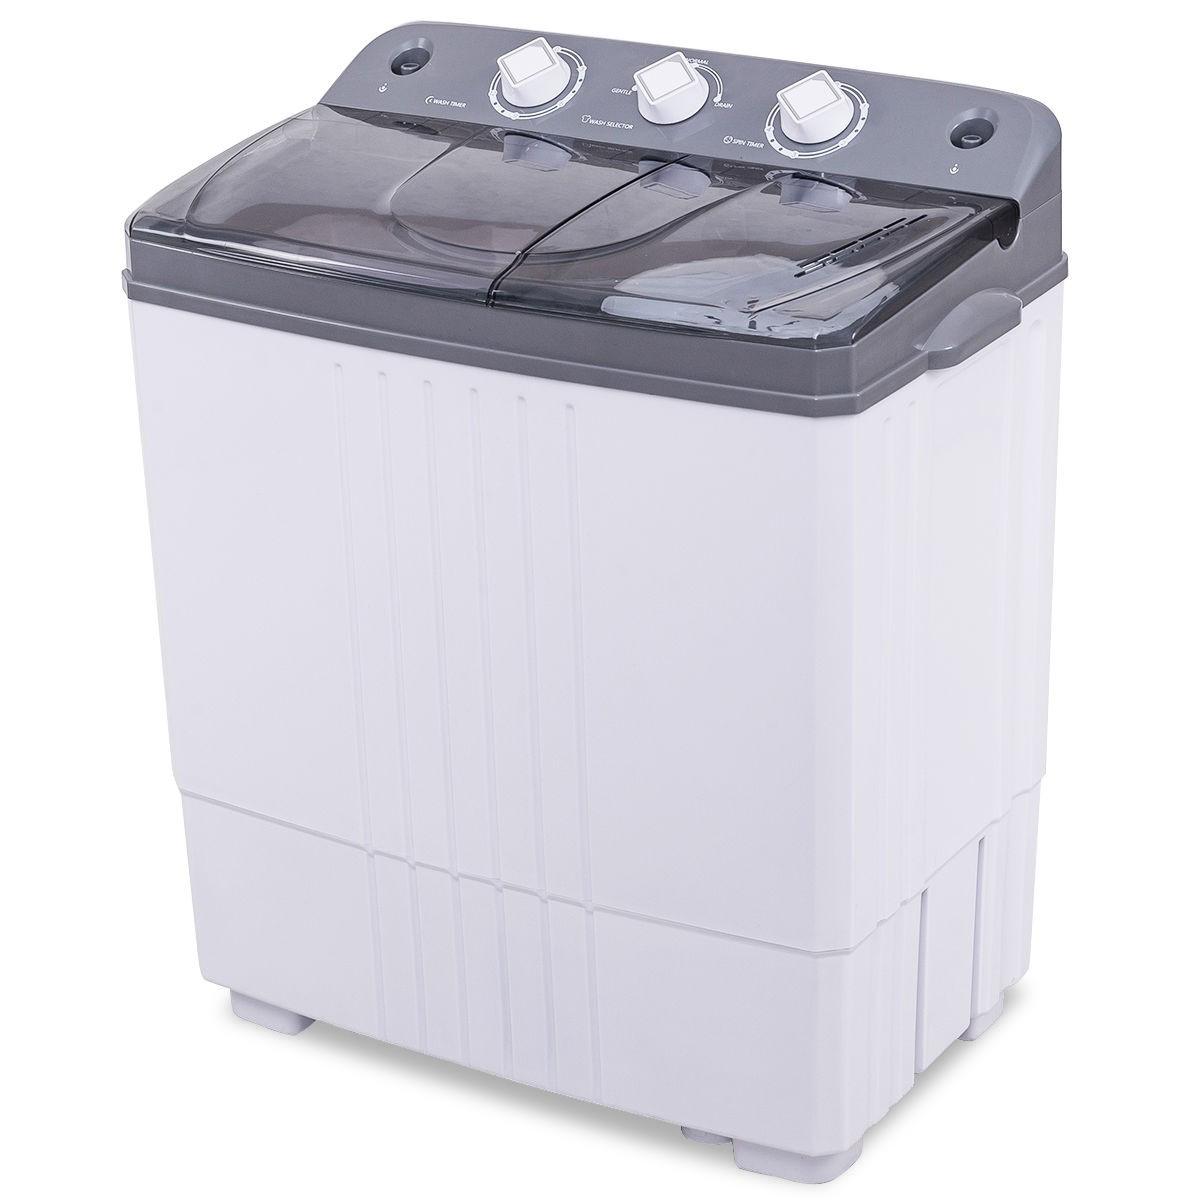 16 lbs Twin-tub Portable Mini Washing Machine